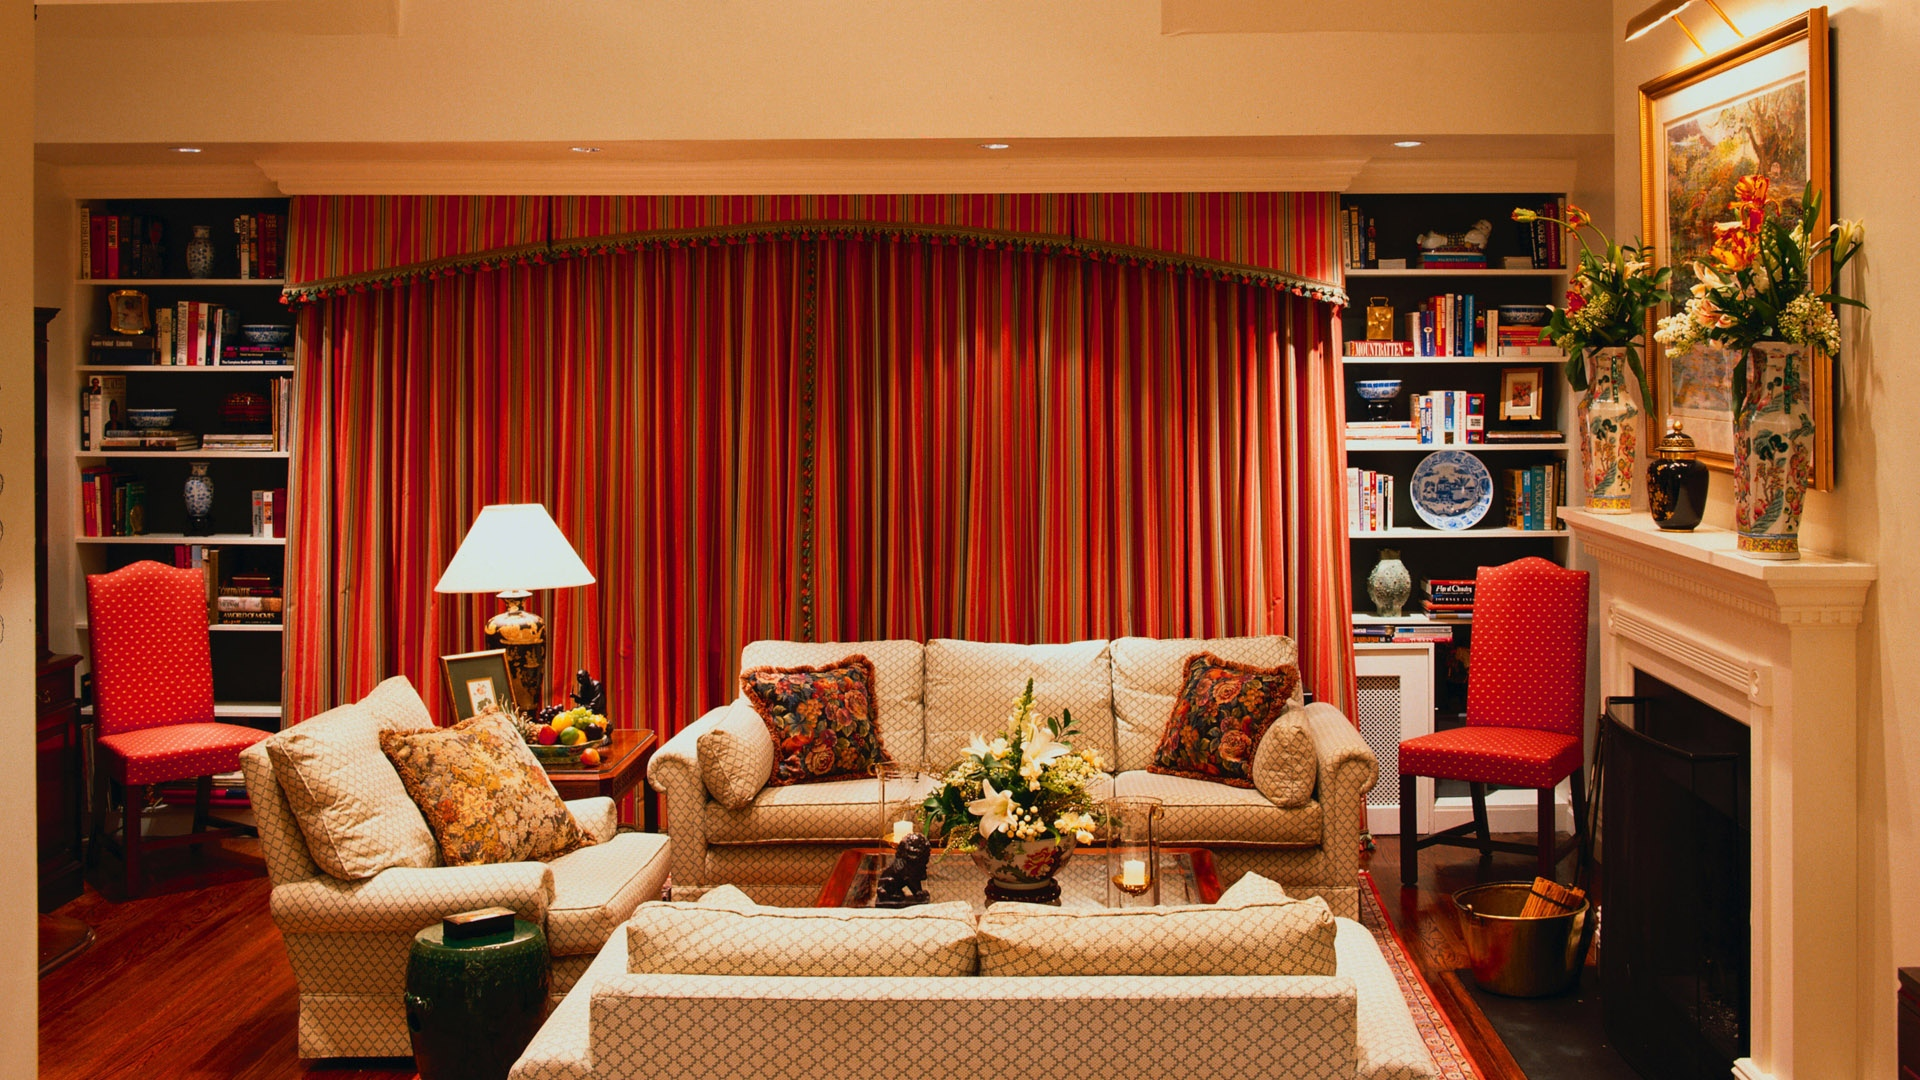 Download Wallpaper 1920x1080 living room, furniture ...